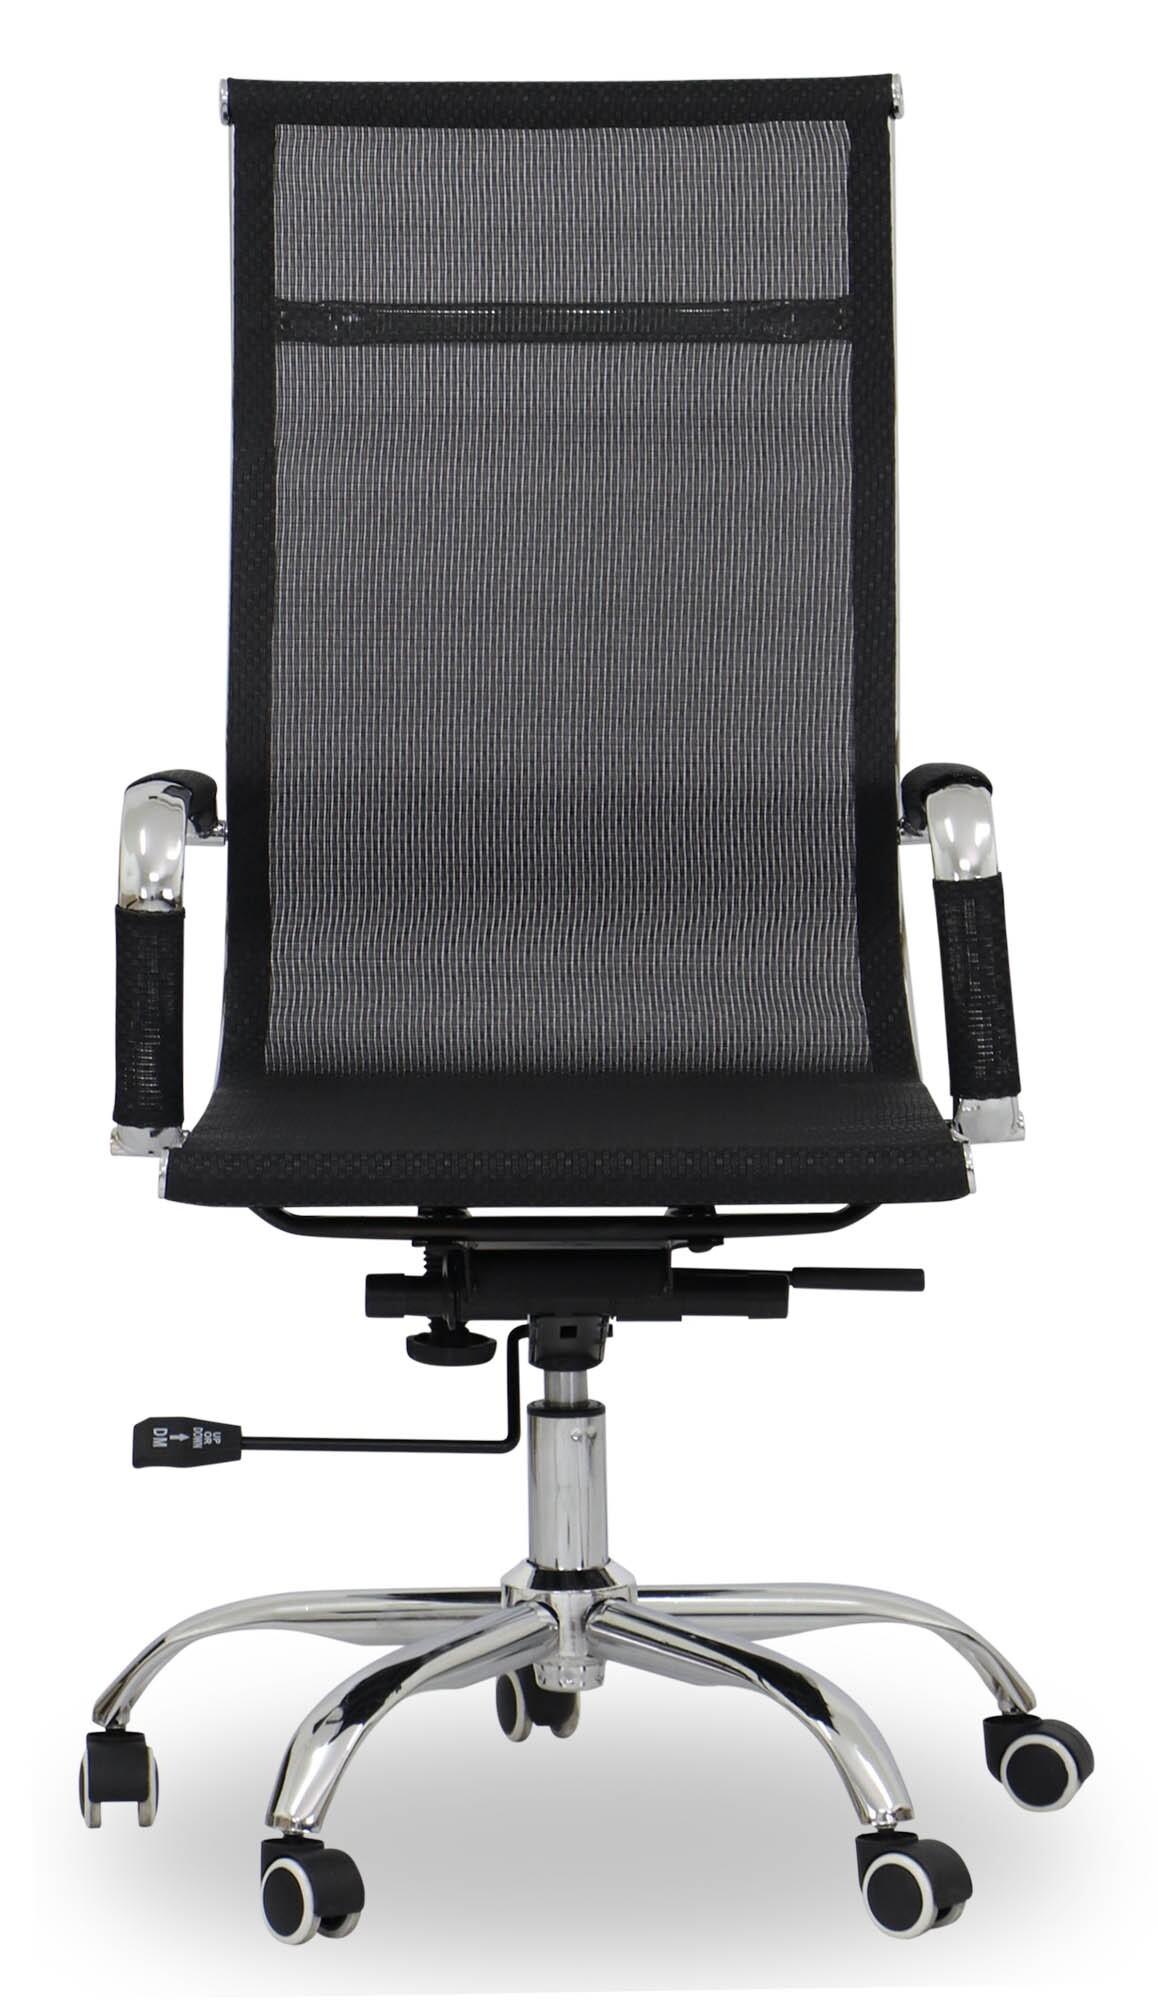 Eames fice Chair Mesh Highback Replica